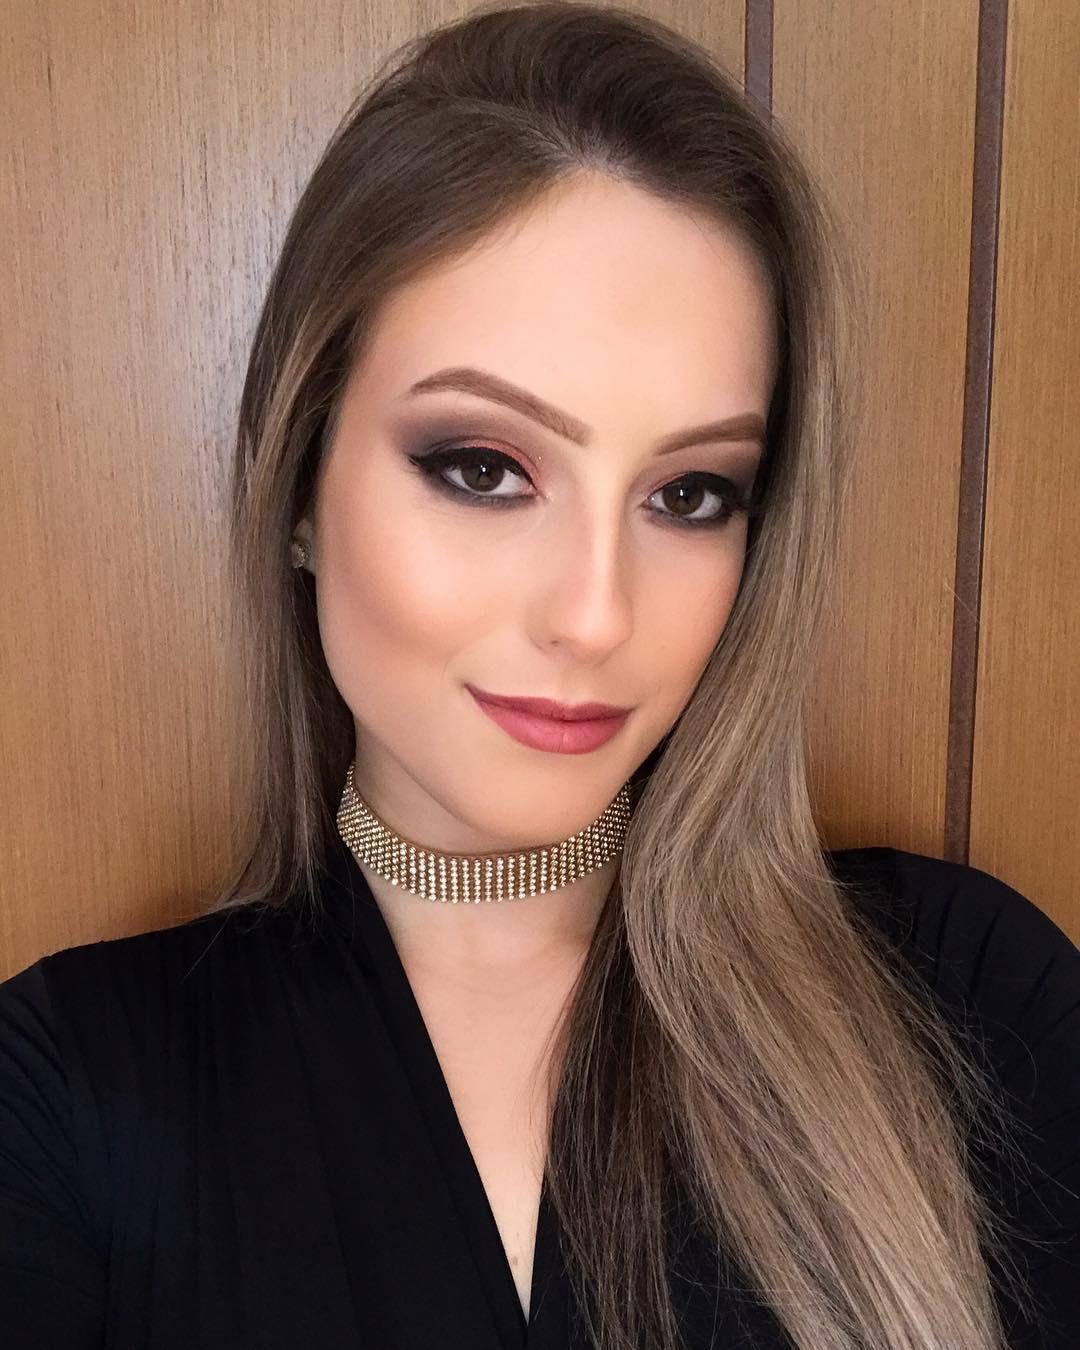 cristine boff sartor, segunda finalista de miss latinoamerica 2019. 20766610